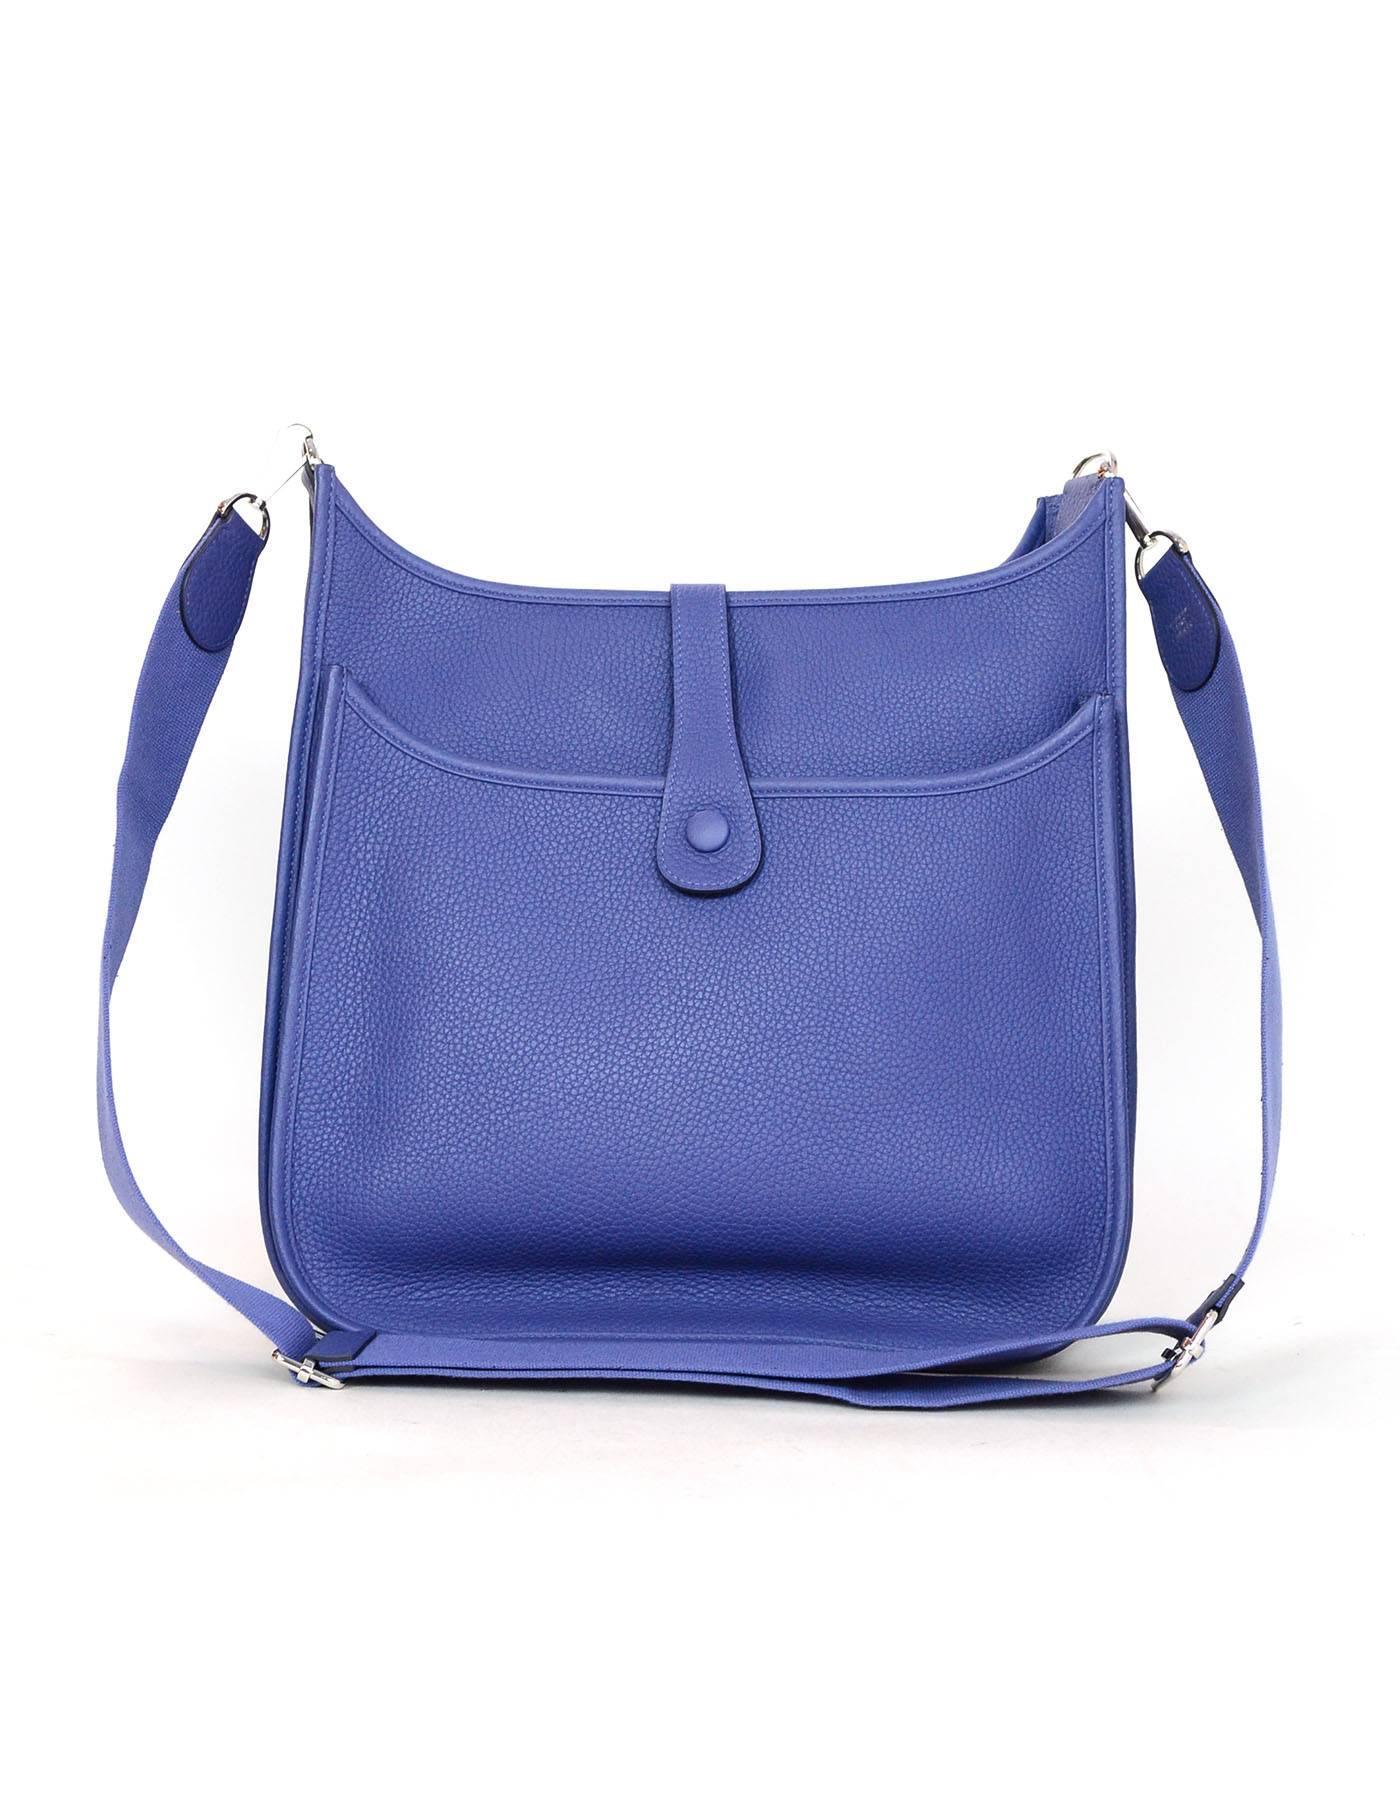 bbacd3407e6d ... hot hermes blue bleu brighton evelyne iii 33 gm messenger bag 2018 in  excellent condition for ...